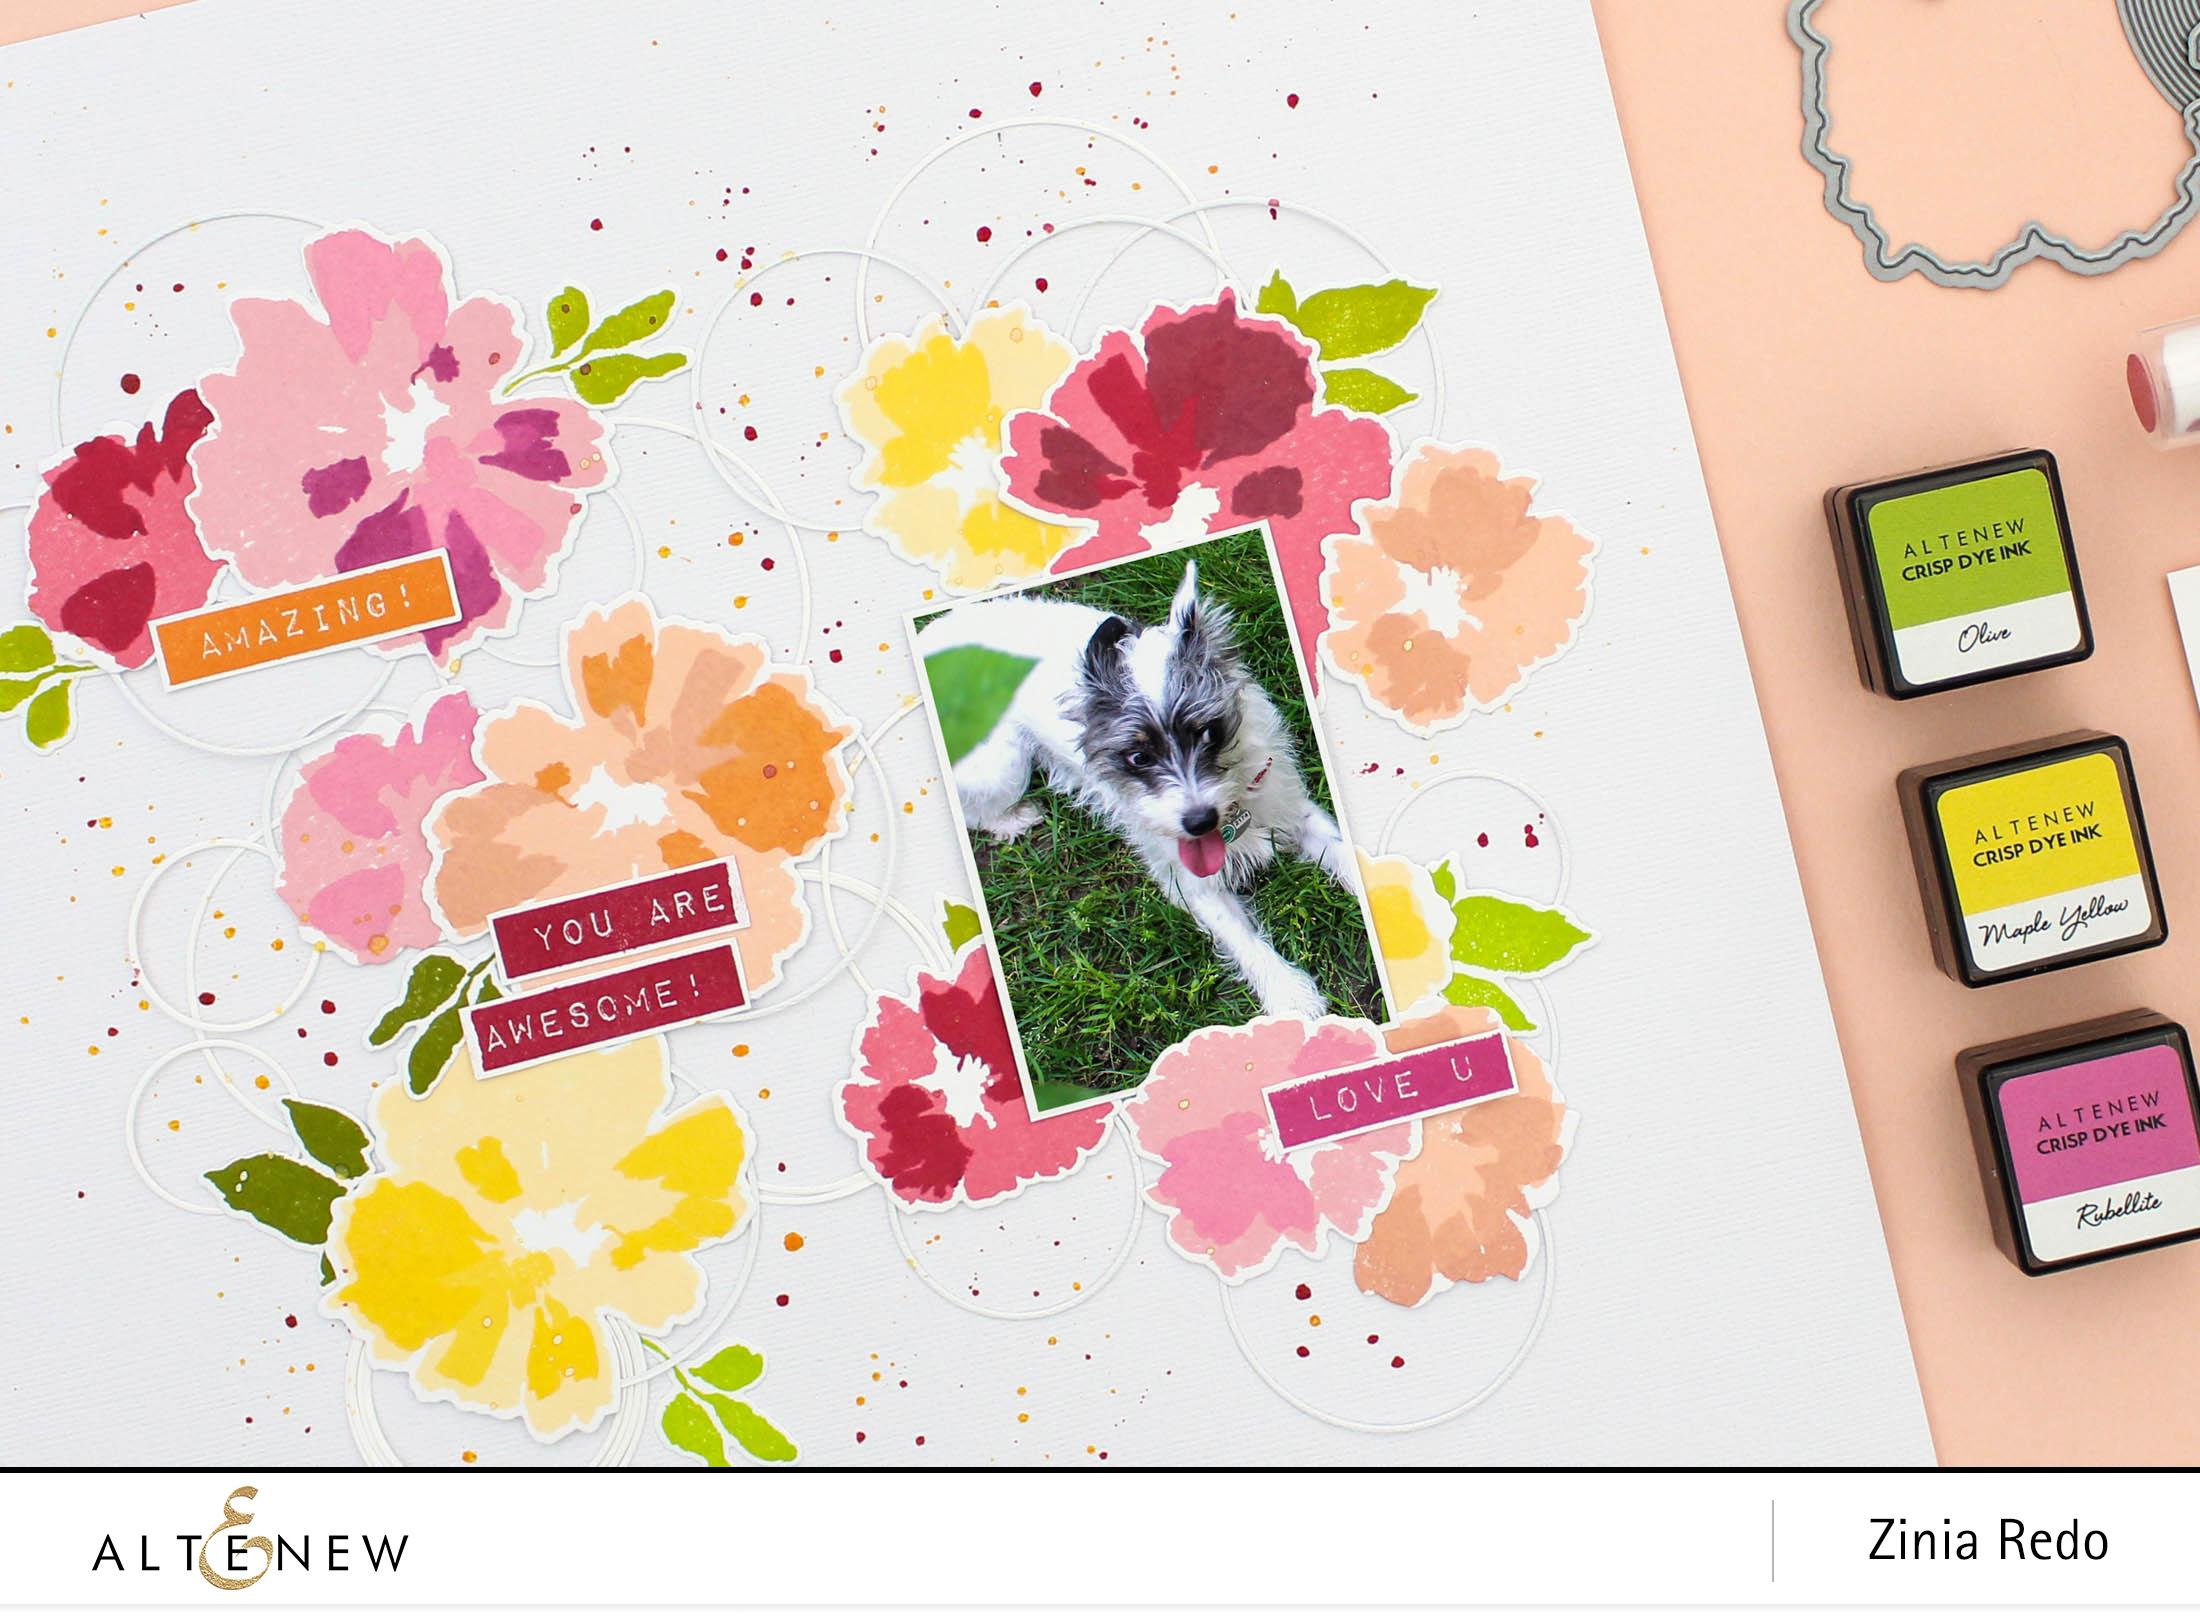 Watercolor Wonders Scrapbook Layout @altenewllc @ziniaredo #ziniaredo #altenew #altenewwatercolorwonders #stamp #stamping #scrapbook #scrapbooking #scrapbooklayout